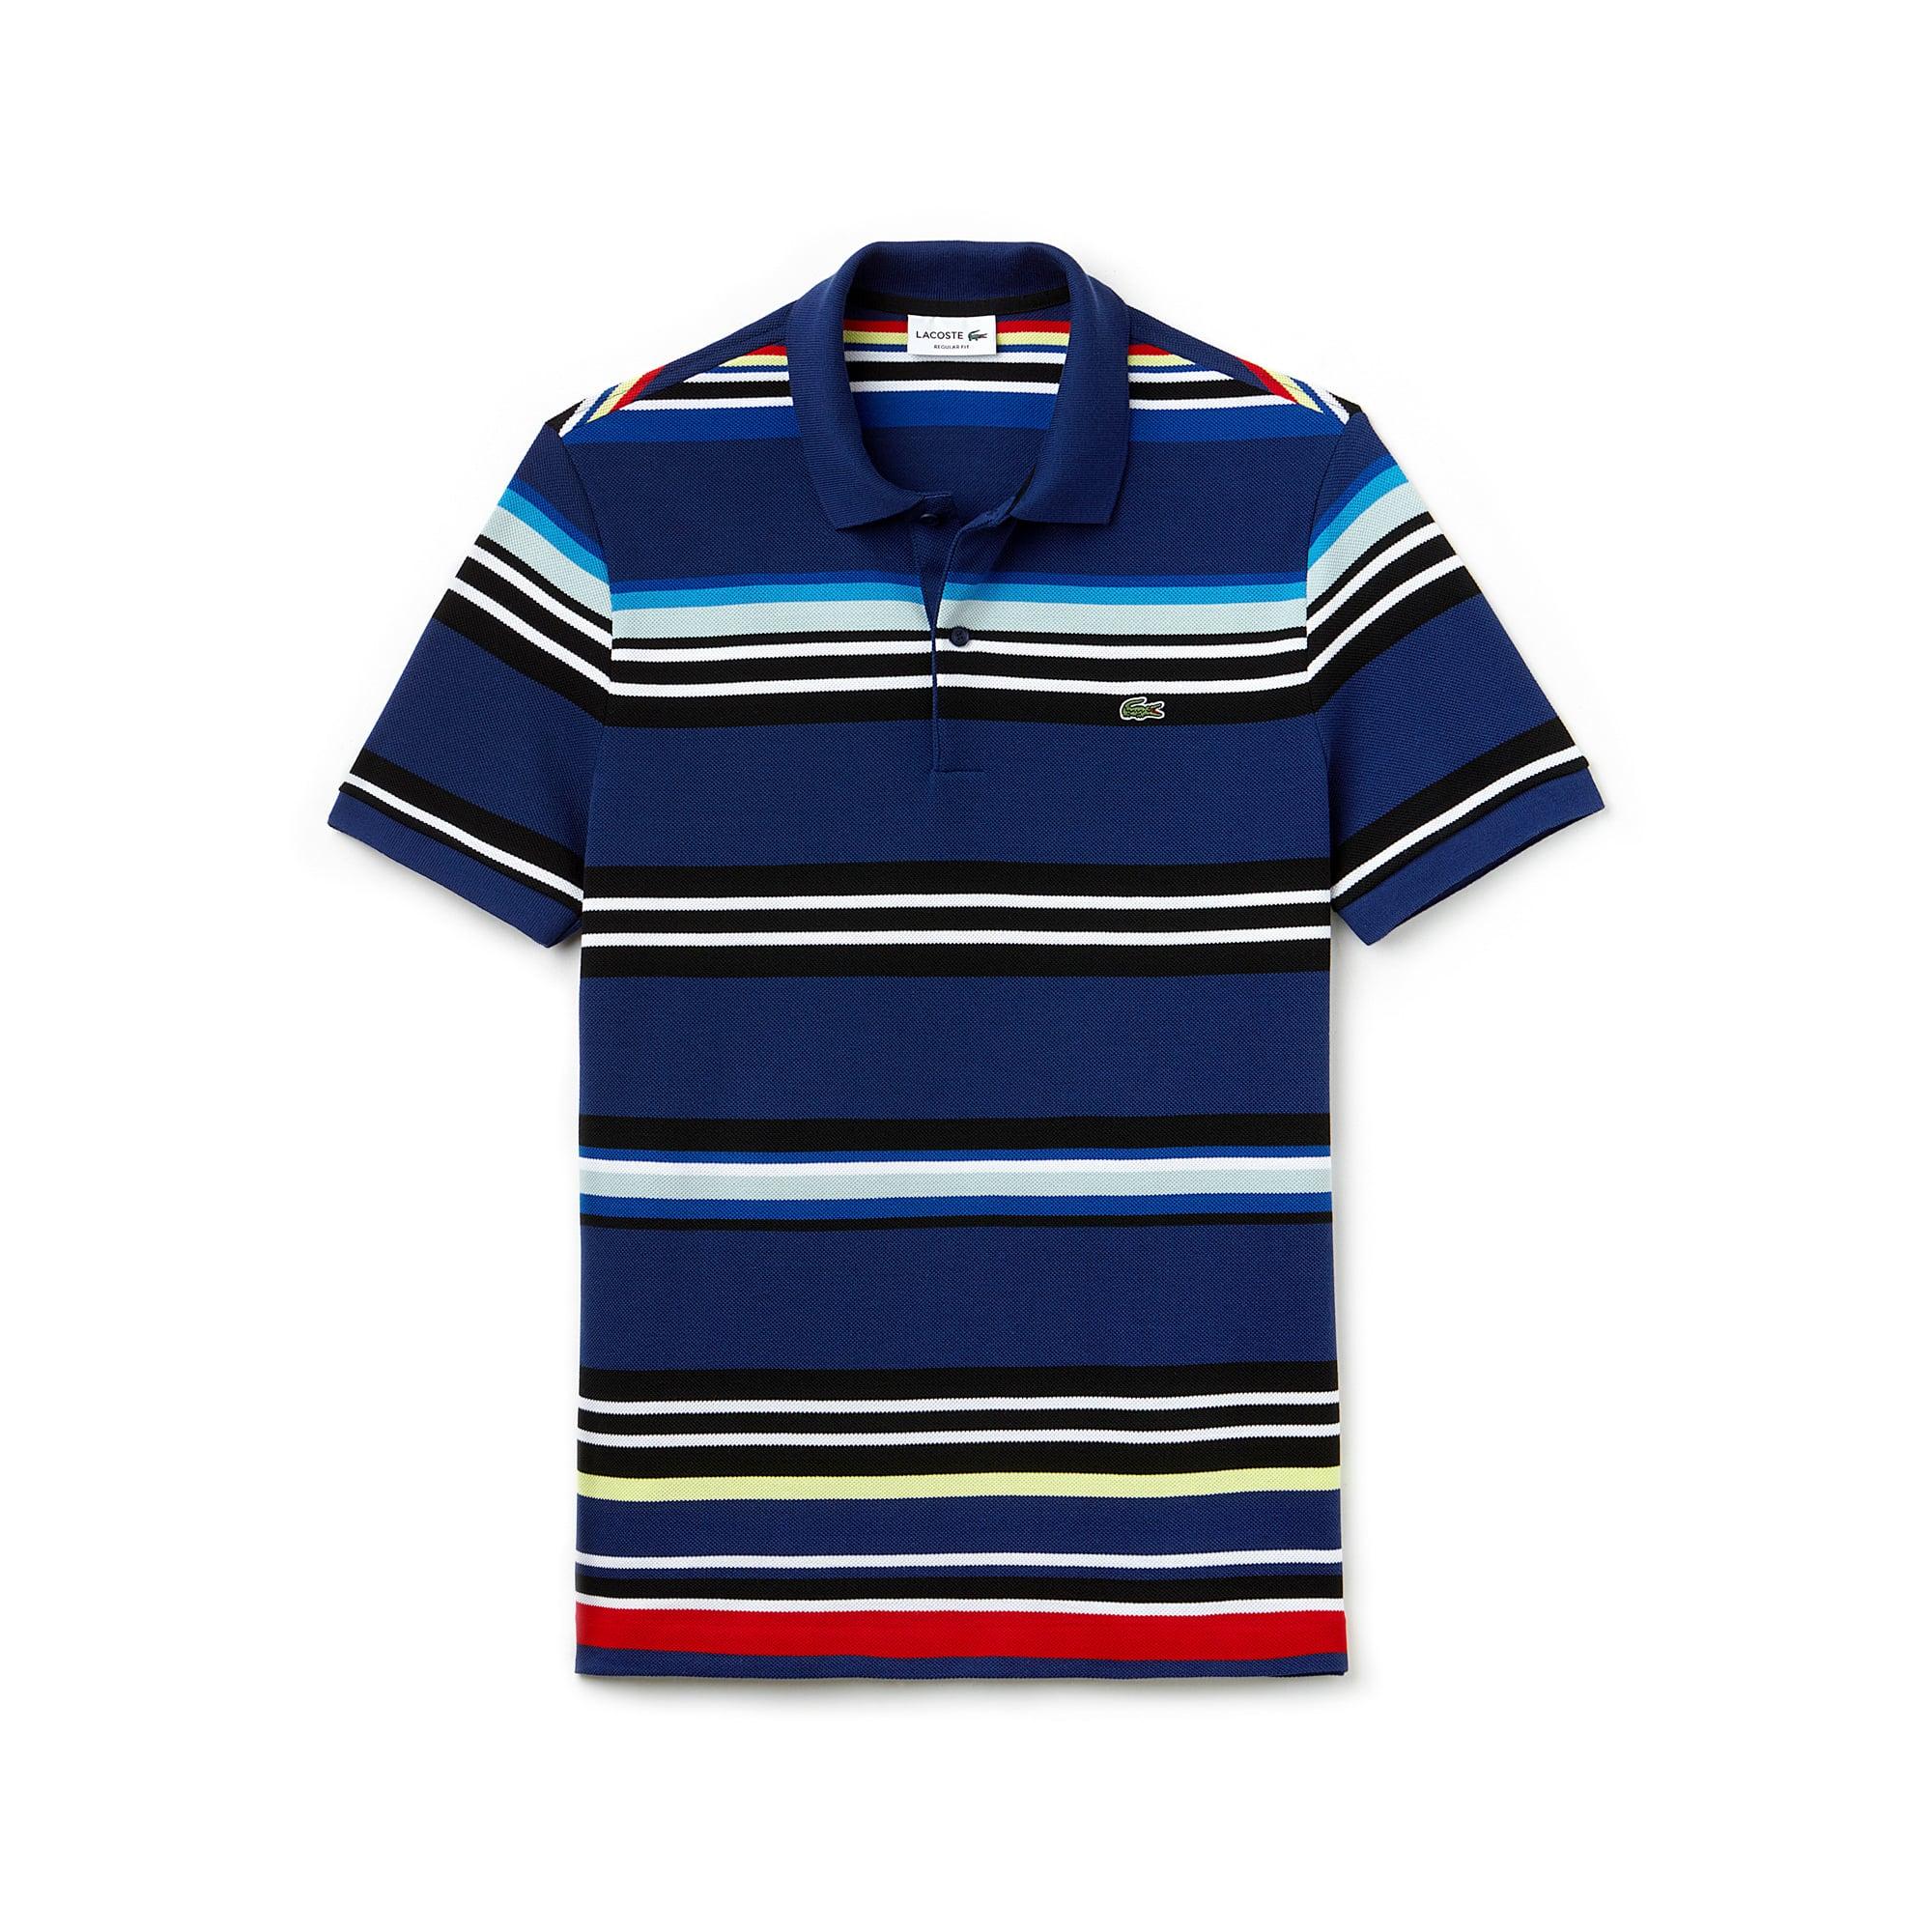 Polo regular fit Lacoste in piqué jaspé a righe colorate